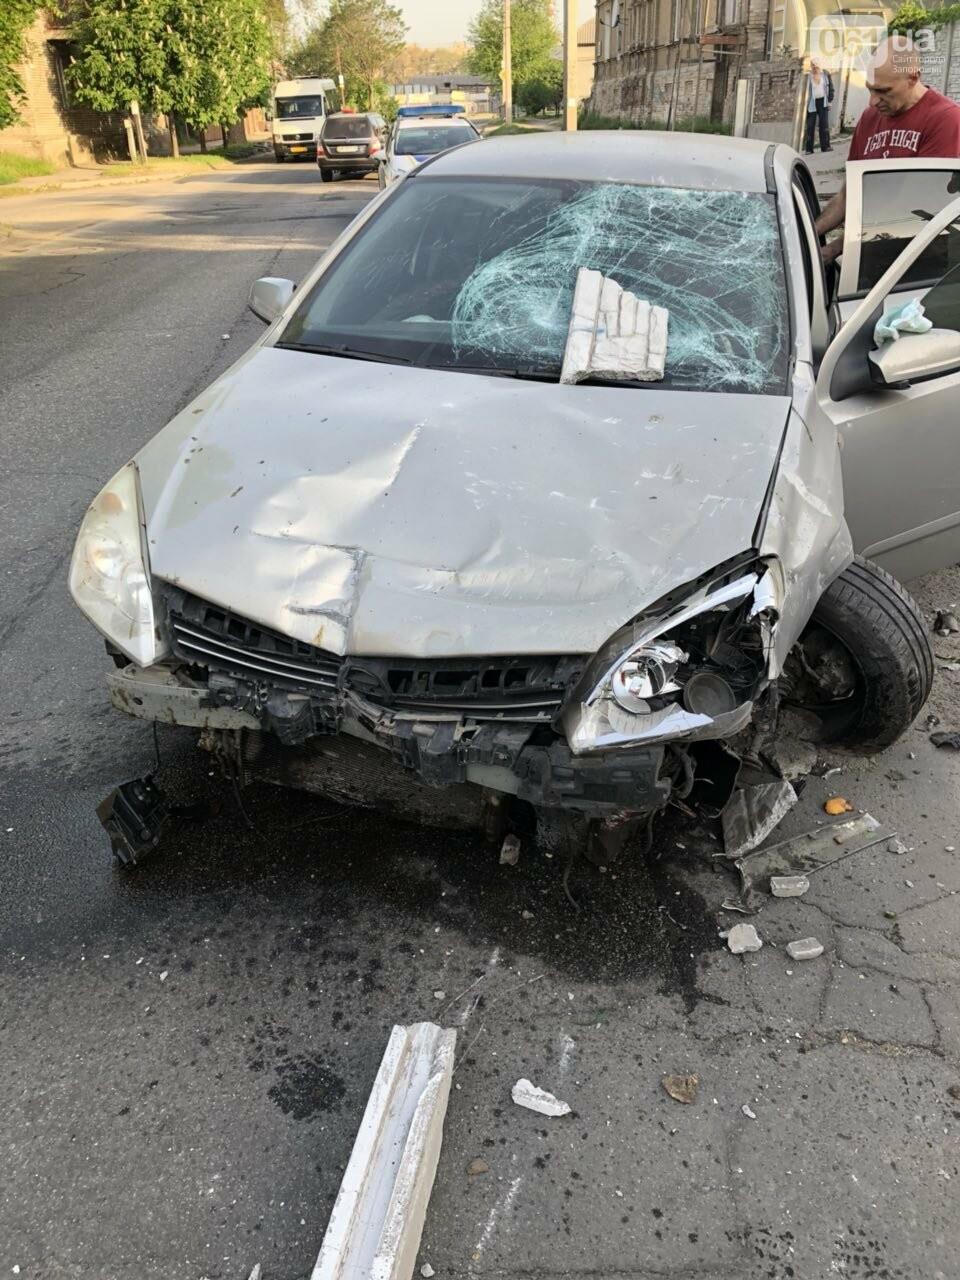 Запорожец разбил автомобиль, въехав в мусорный бак, - ФОТО, фото-1